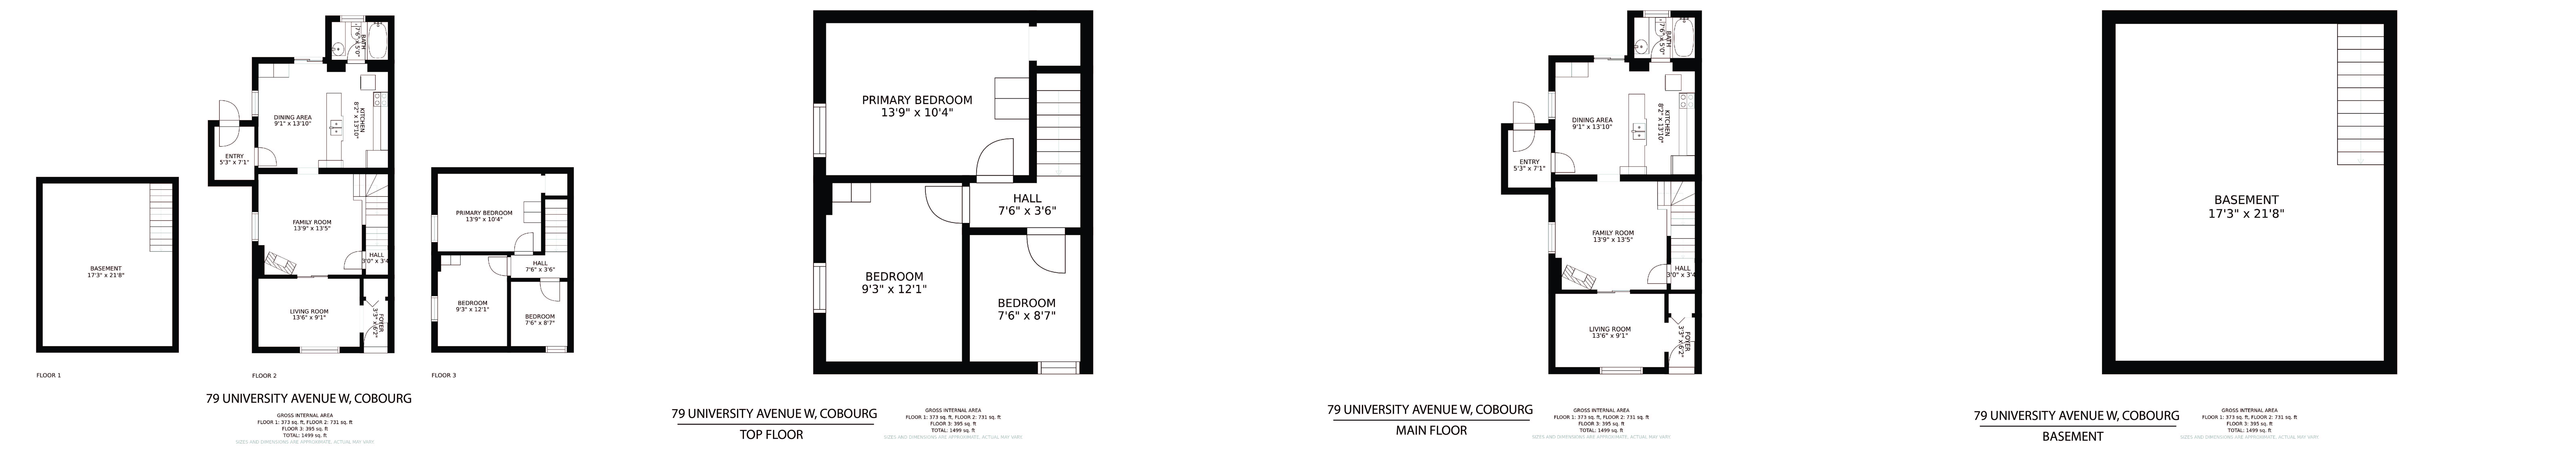 79 University Avenue W floorplan